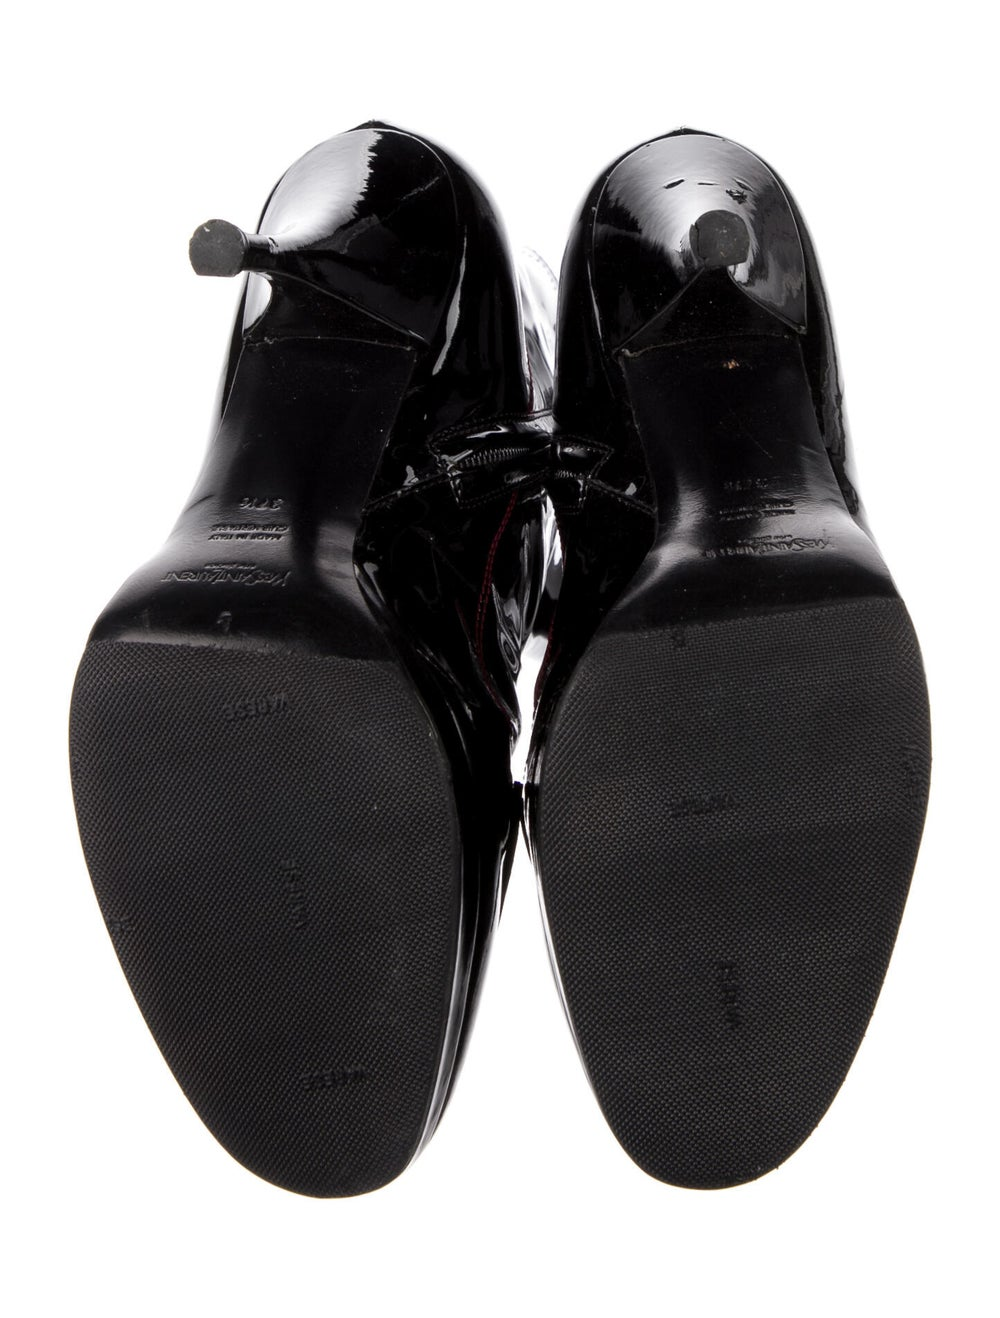 Yves Saint Laurent Rive Gauche Patent Leather Boo… - image 5